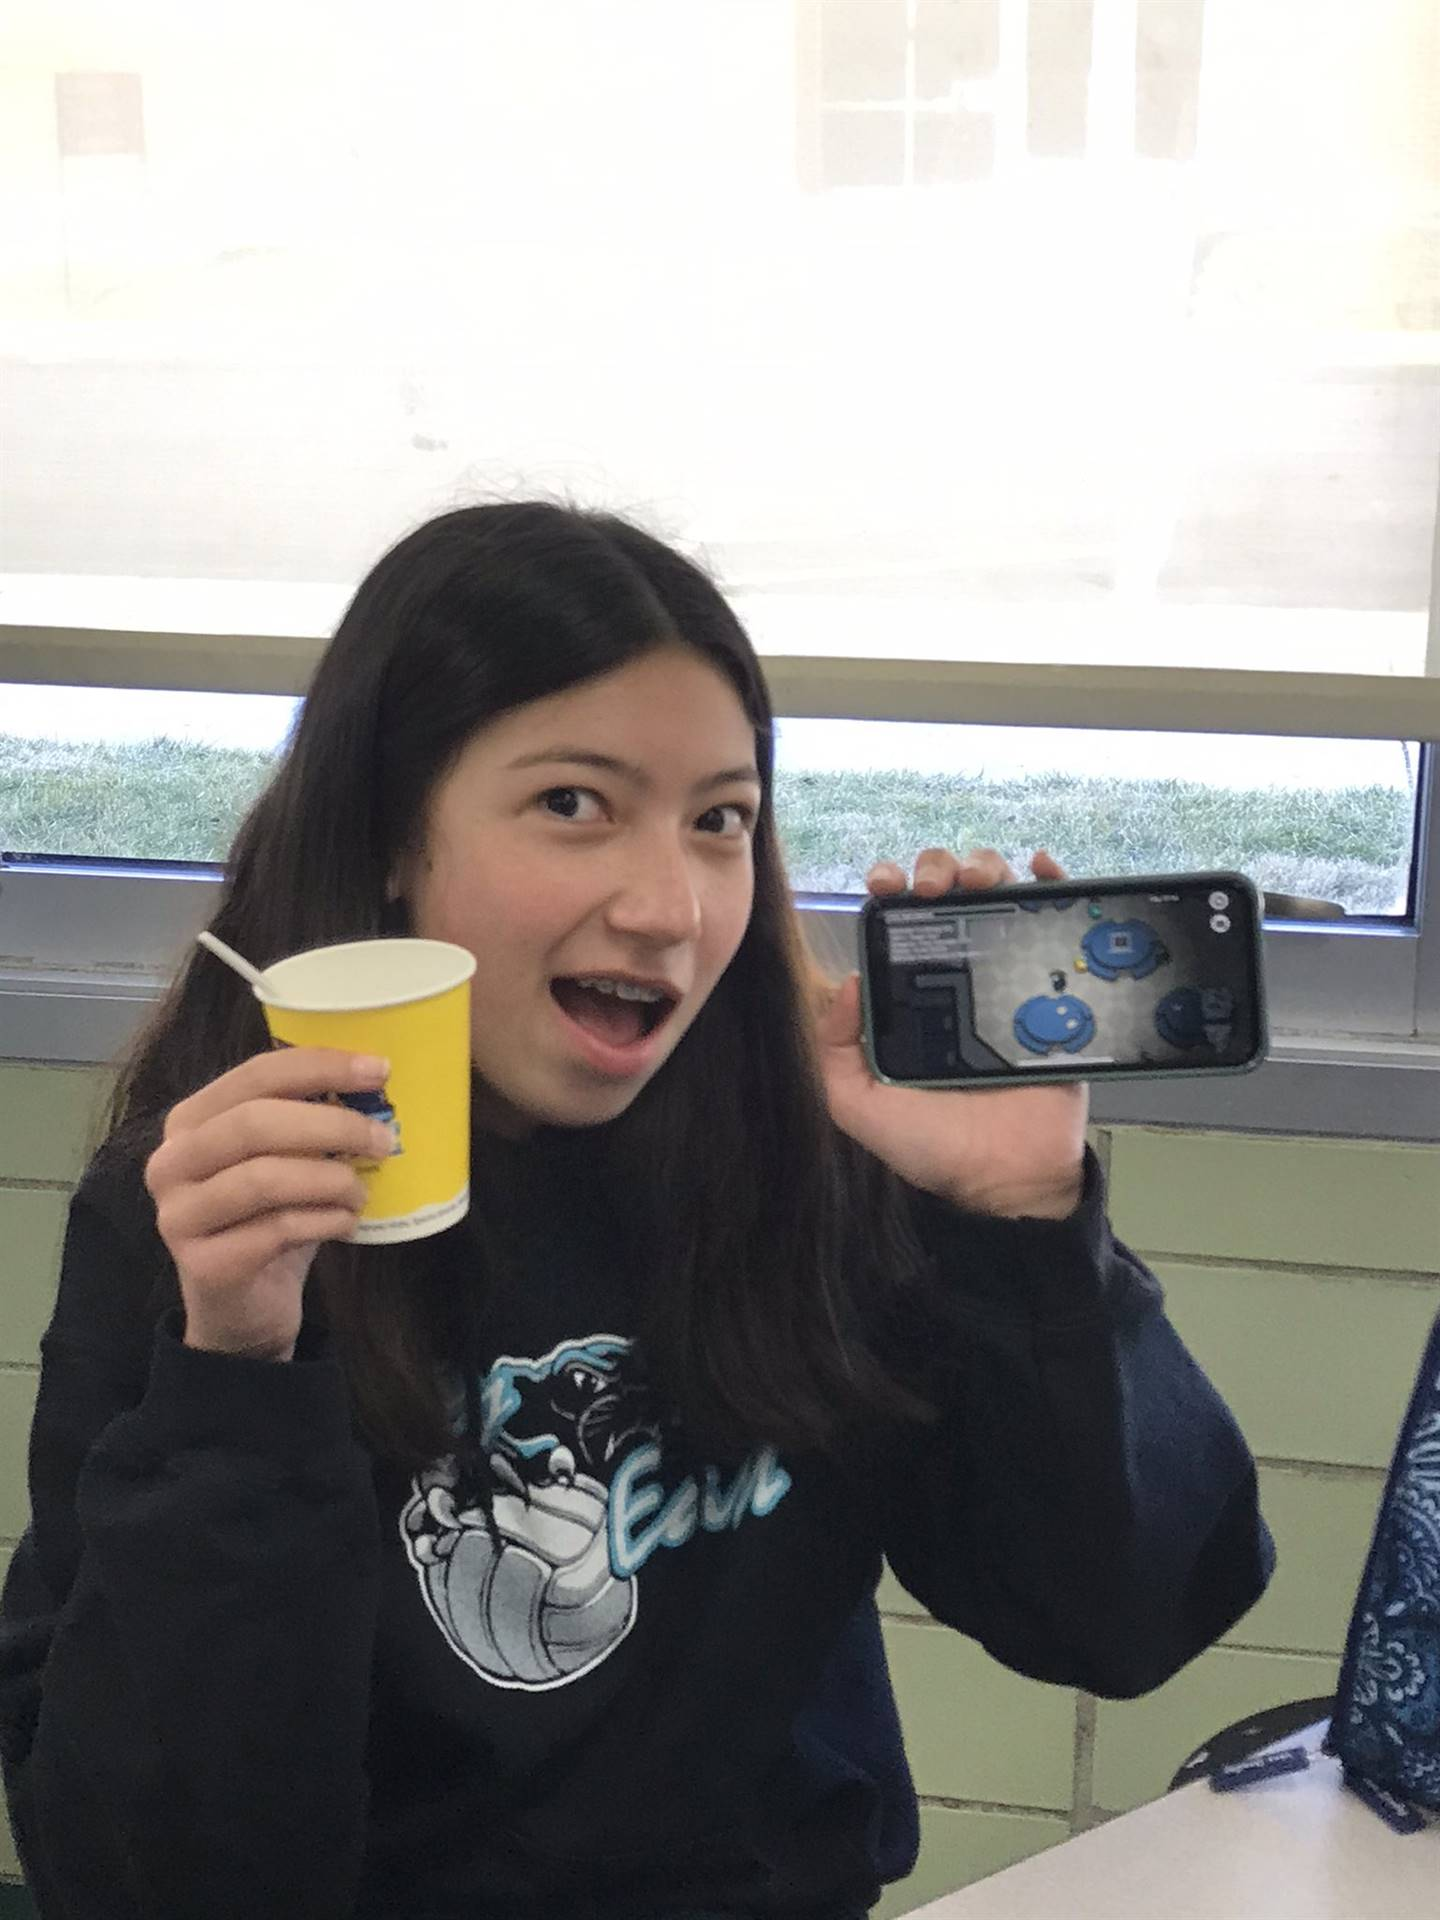 Student with slushie and phone